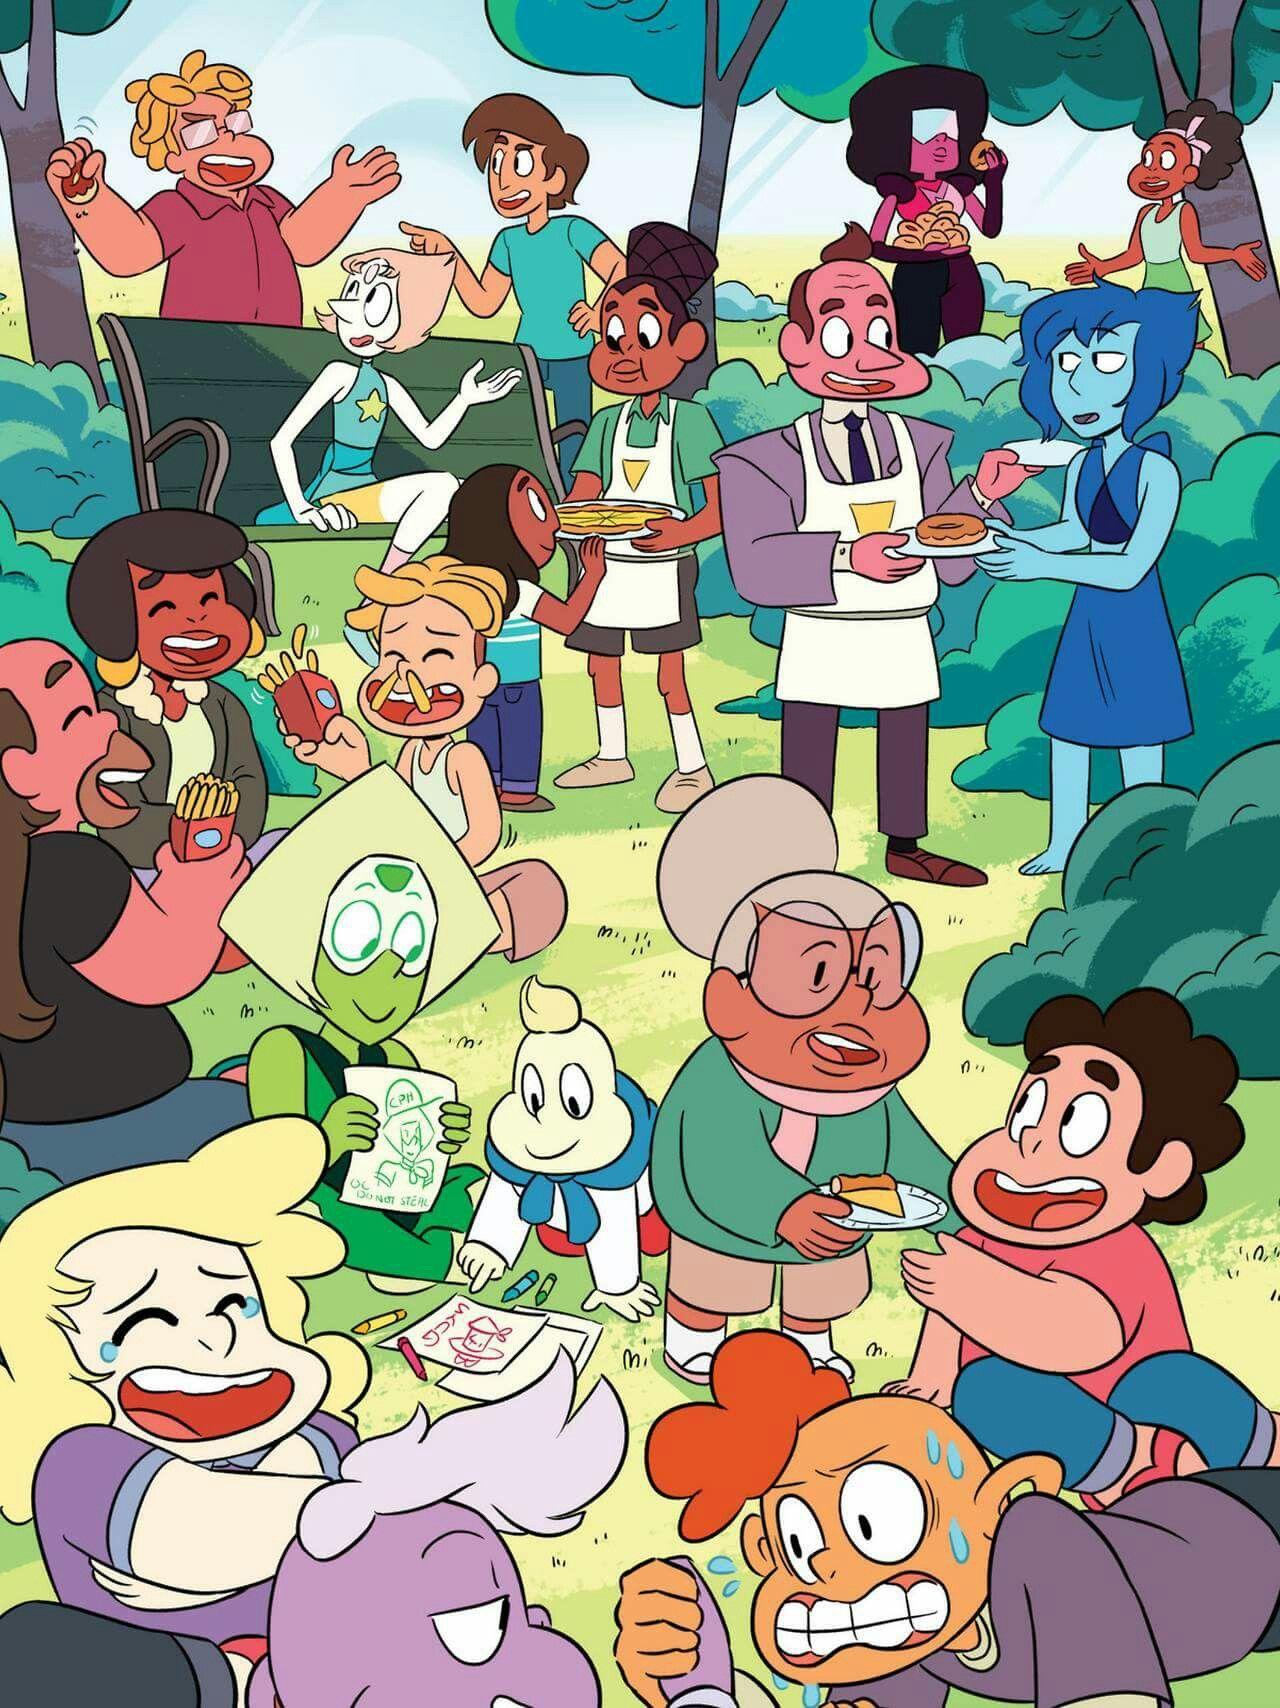 Kim Cartoon Steven Universe